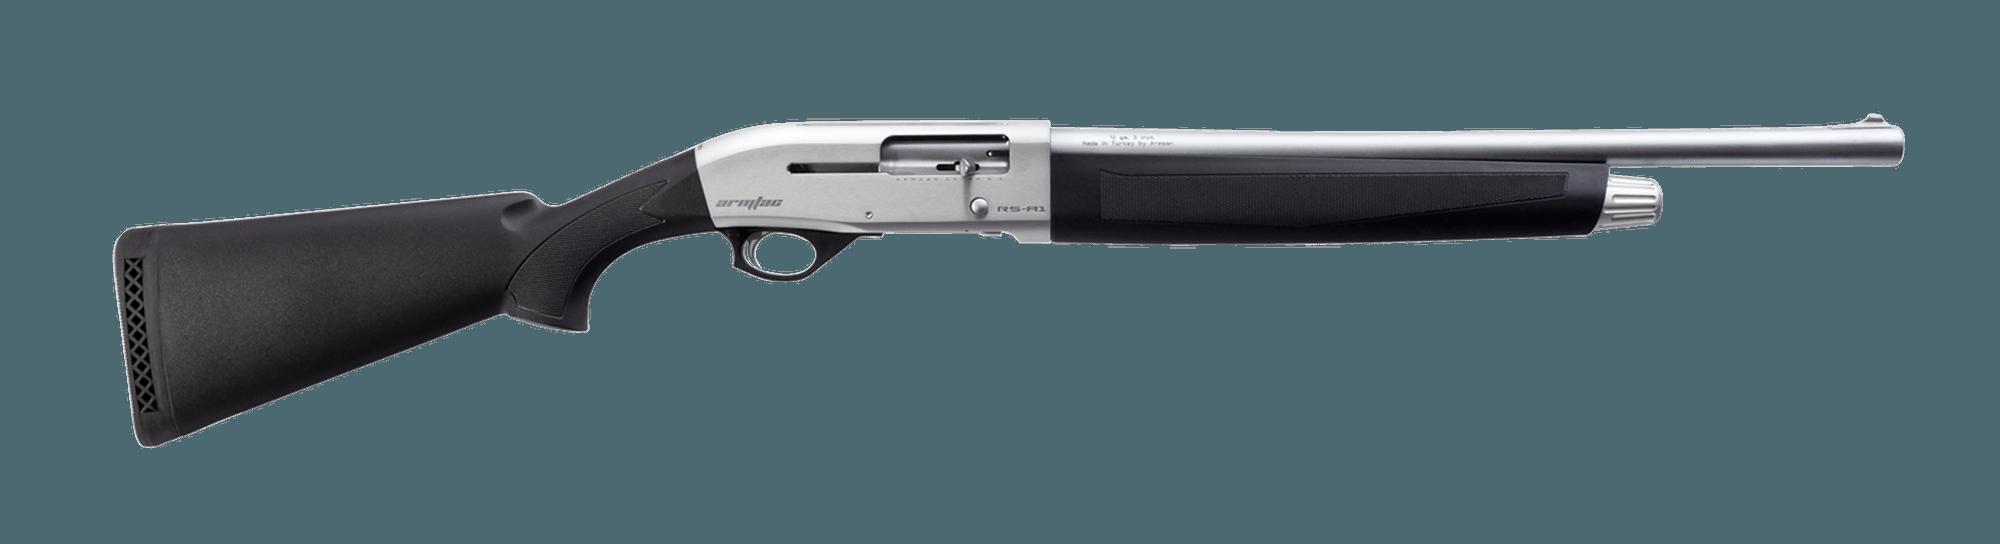 Турецкая роскошь: ружья армсан 612 и phenoma для охоты